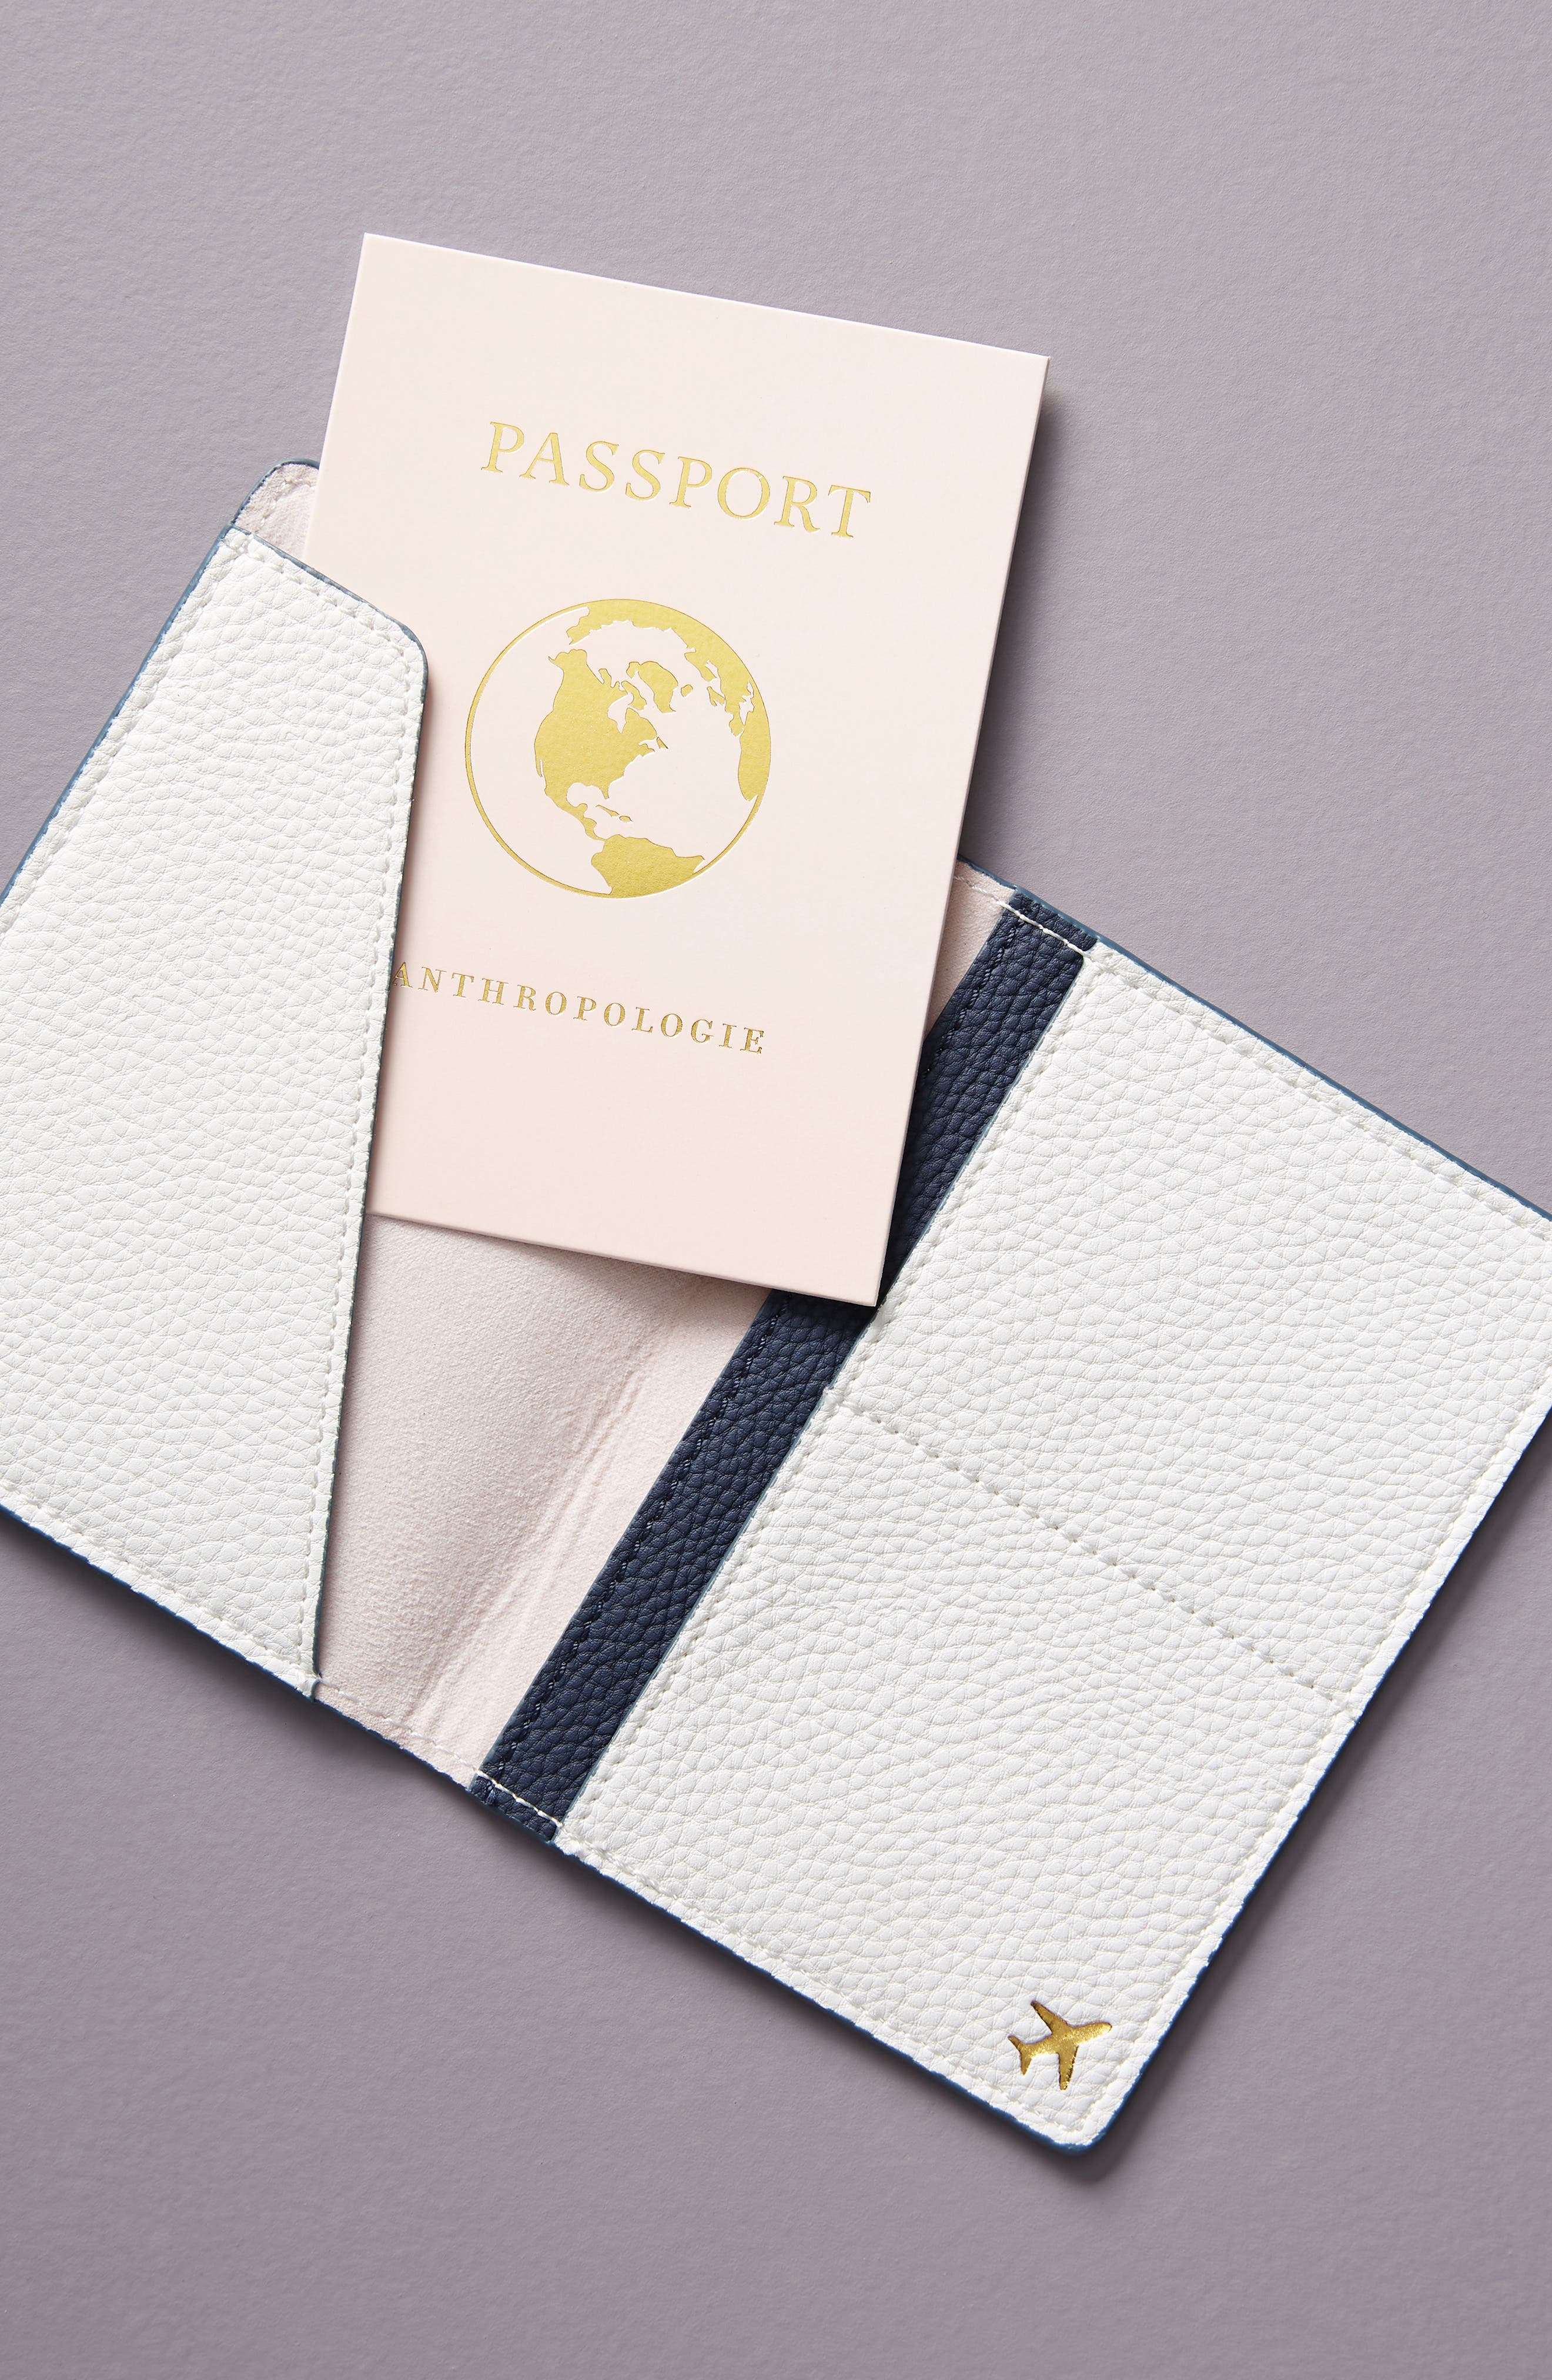 90be0b9ca Anthropologie Travel Accessories  Passport Holders   More